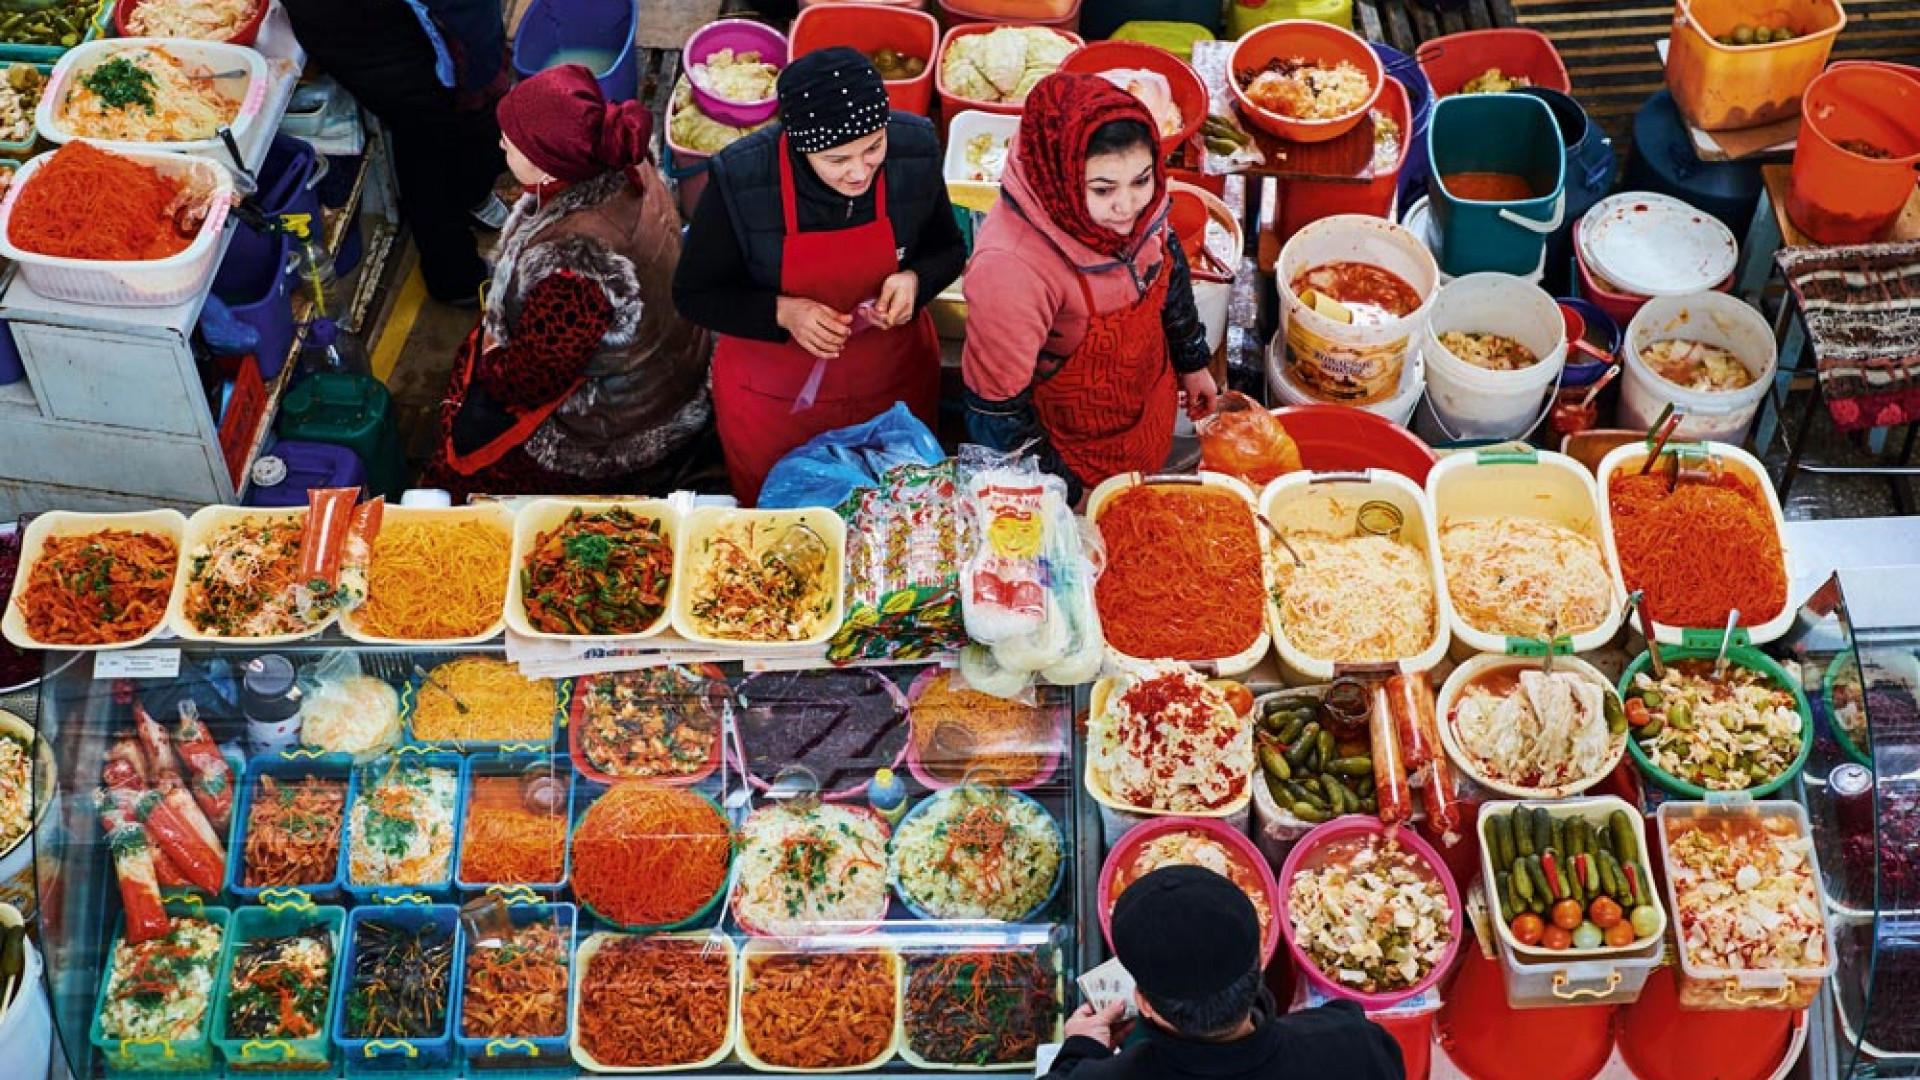 Uzbekistan, Tashkent, Chorsu bazar, food market